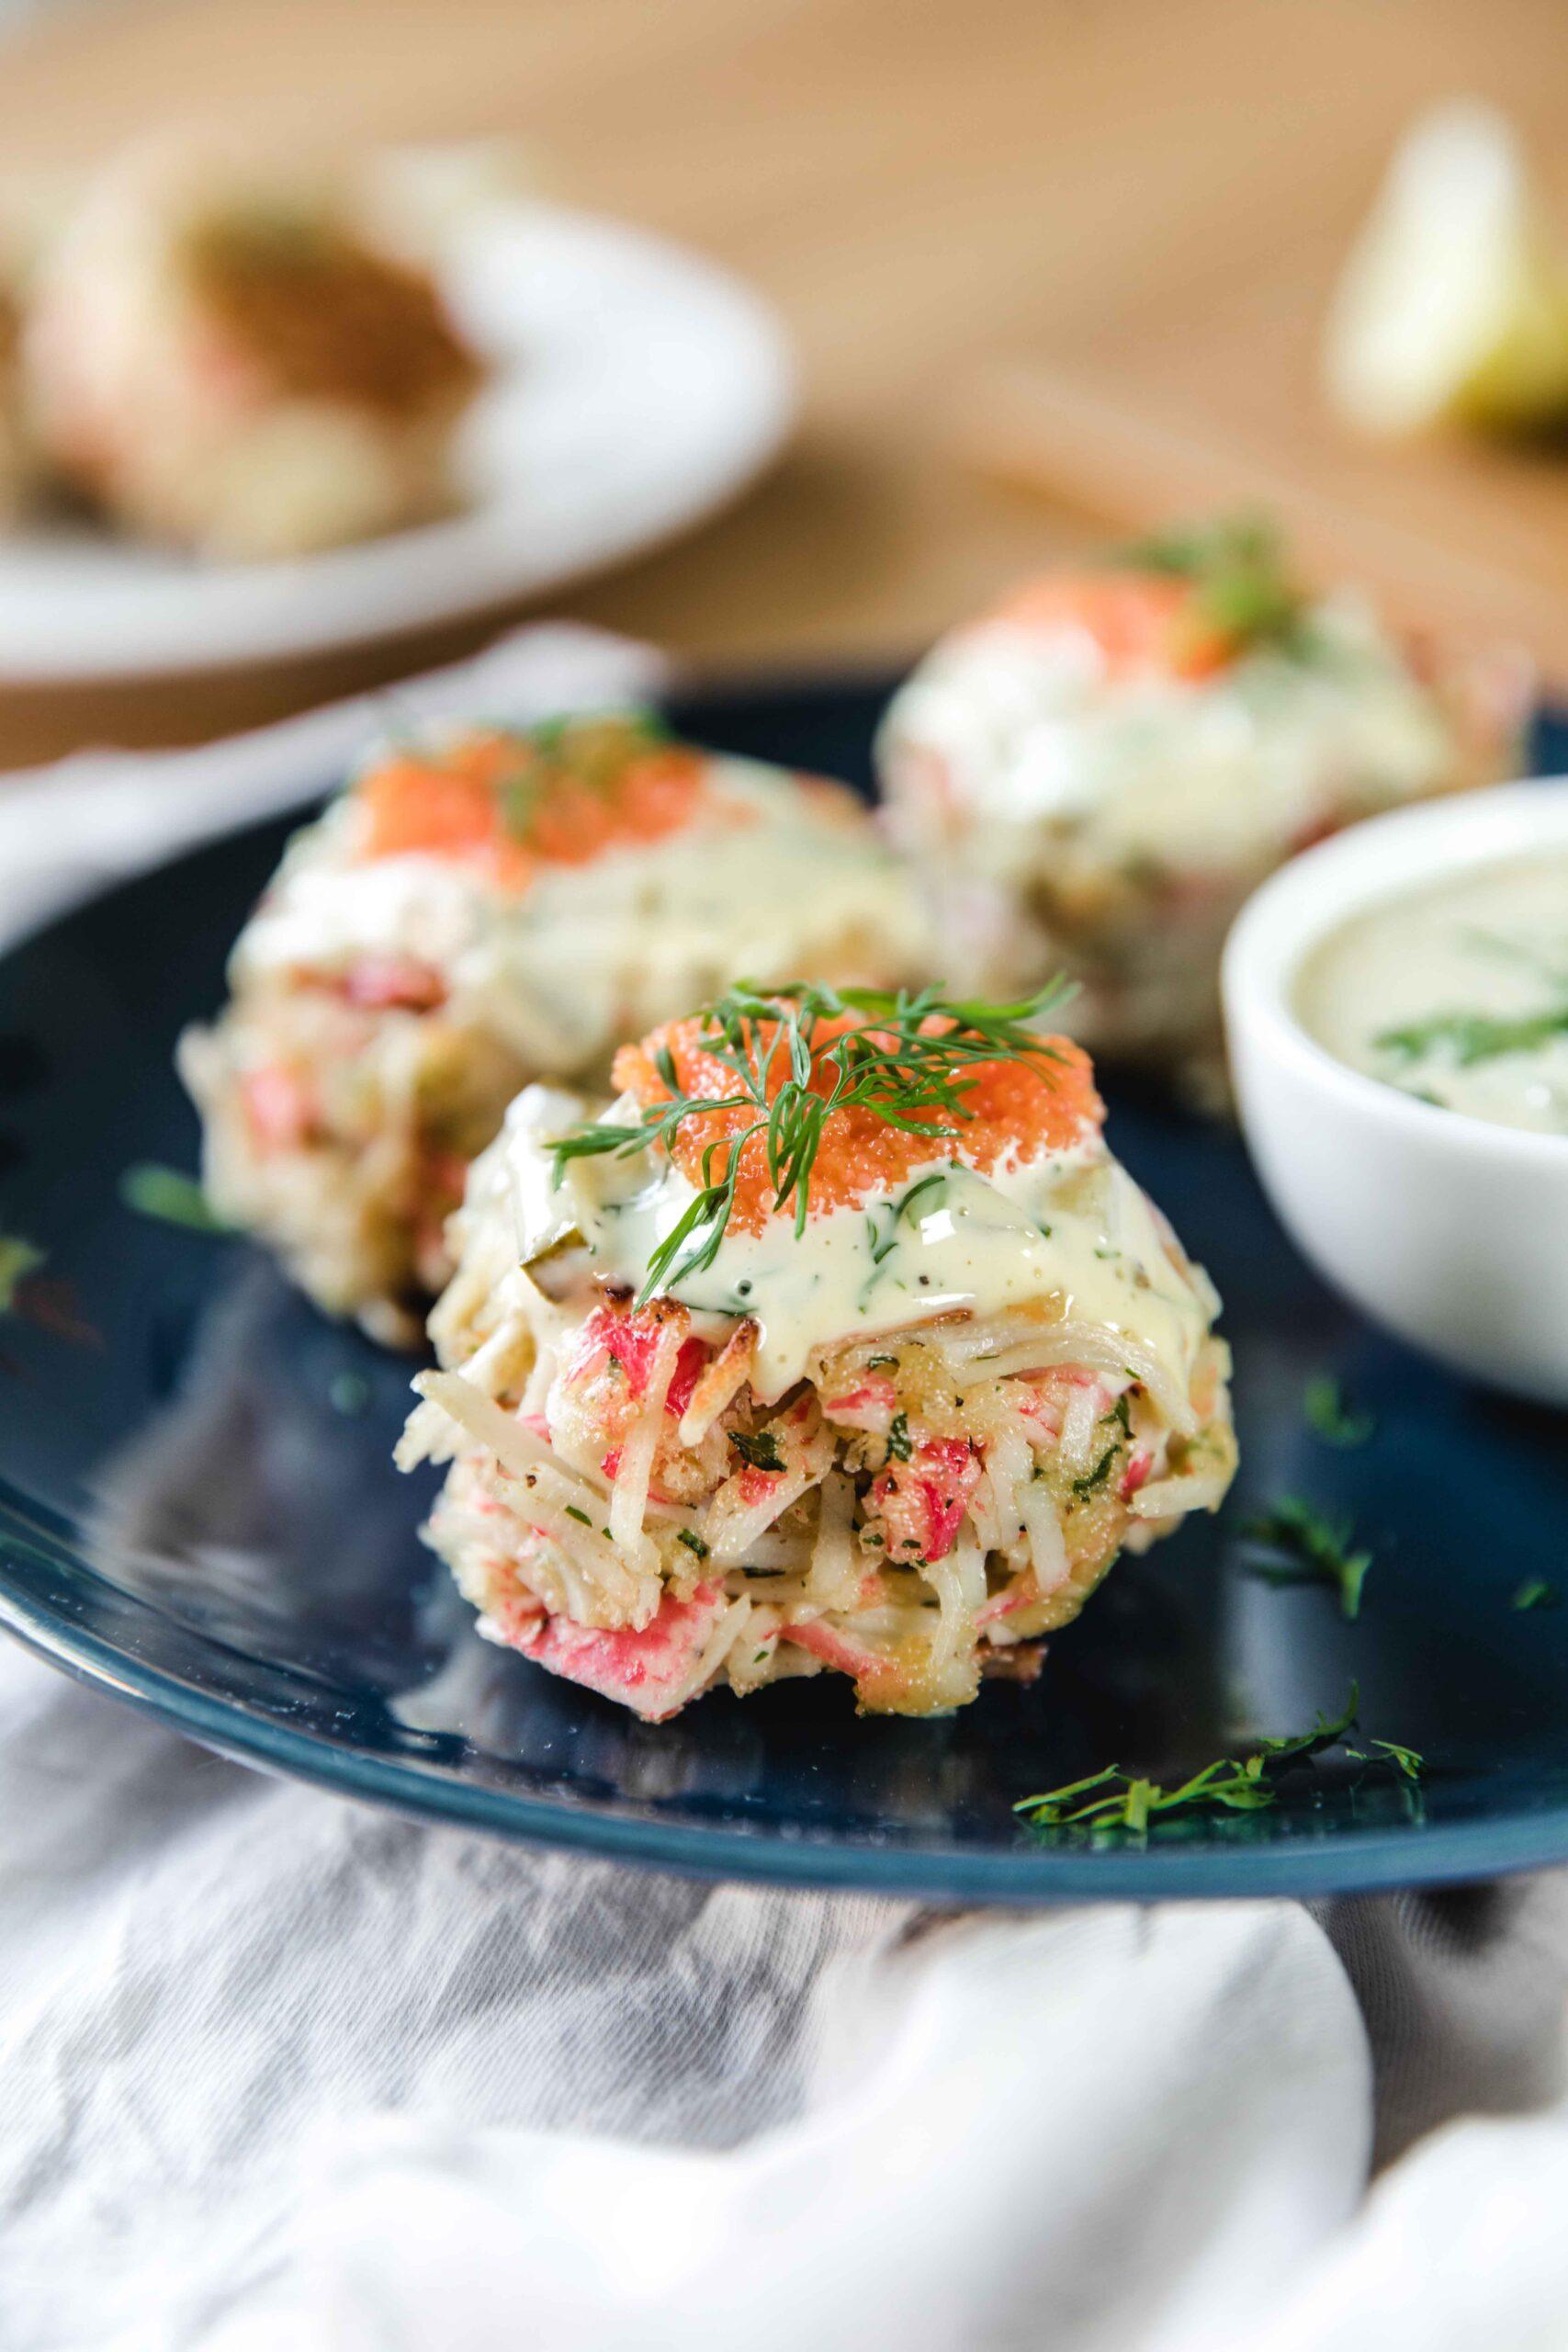 Crab cakes recipe with sauce